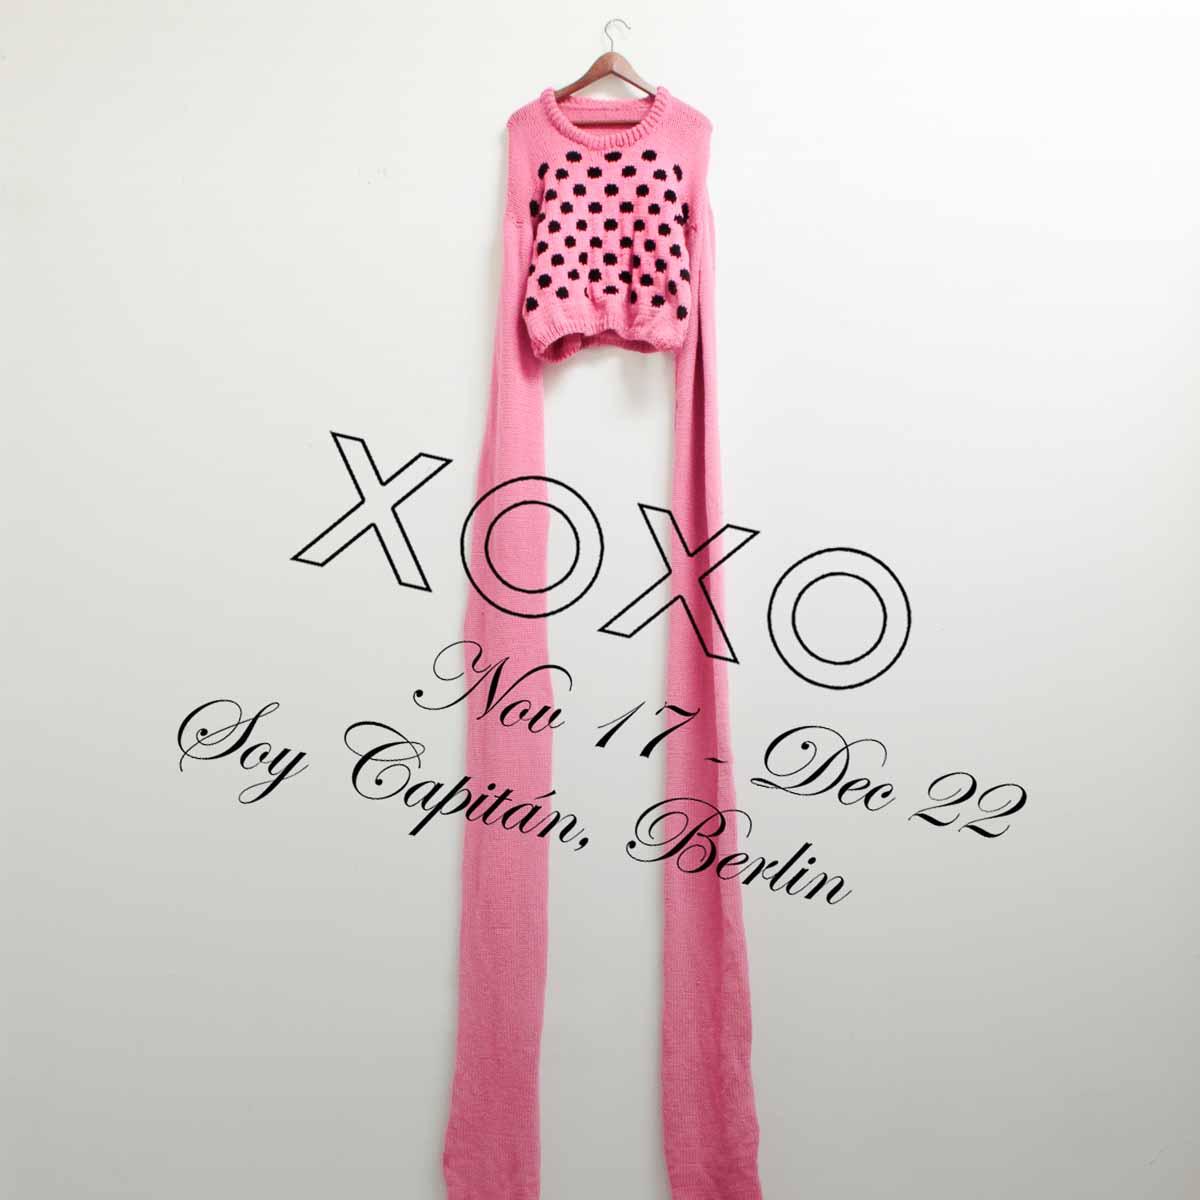 Ausstellung XOXO in der Galerie Soy Capitán Berlin Kreuzberg